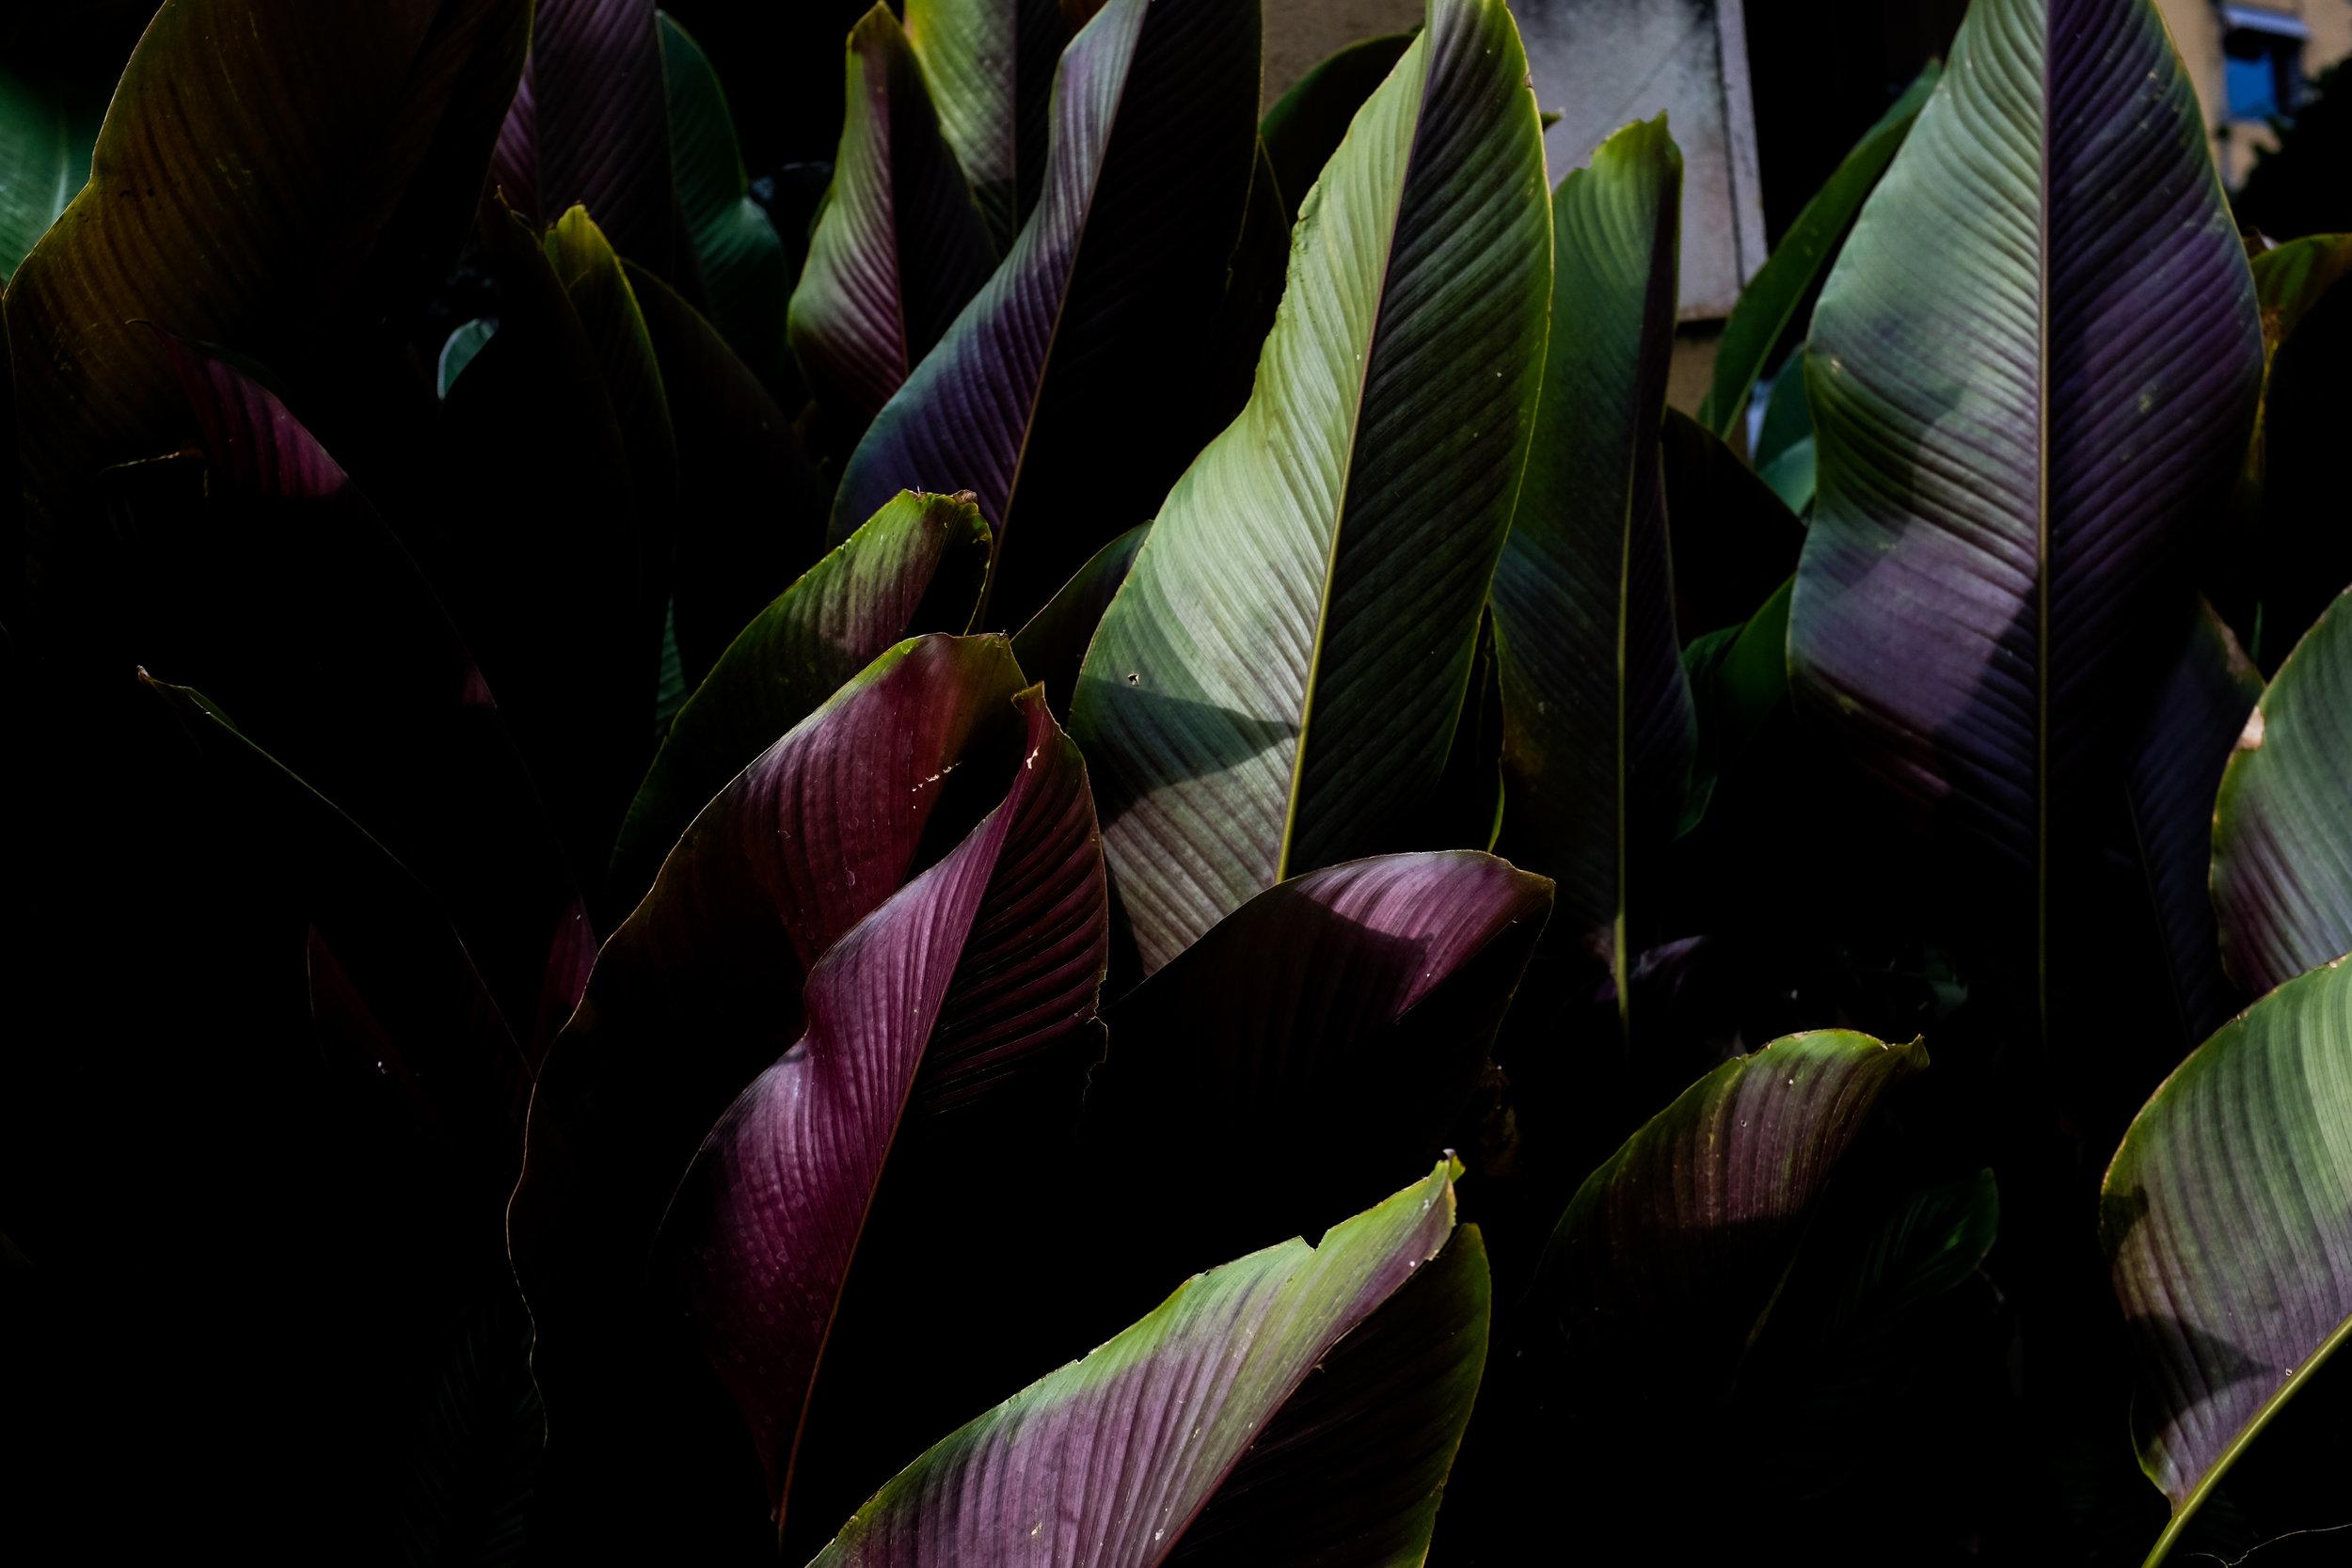 Plants of Bali, by Neave Bozorgi